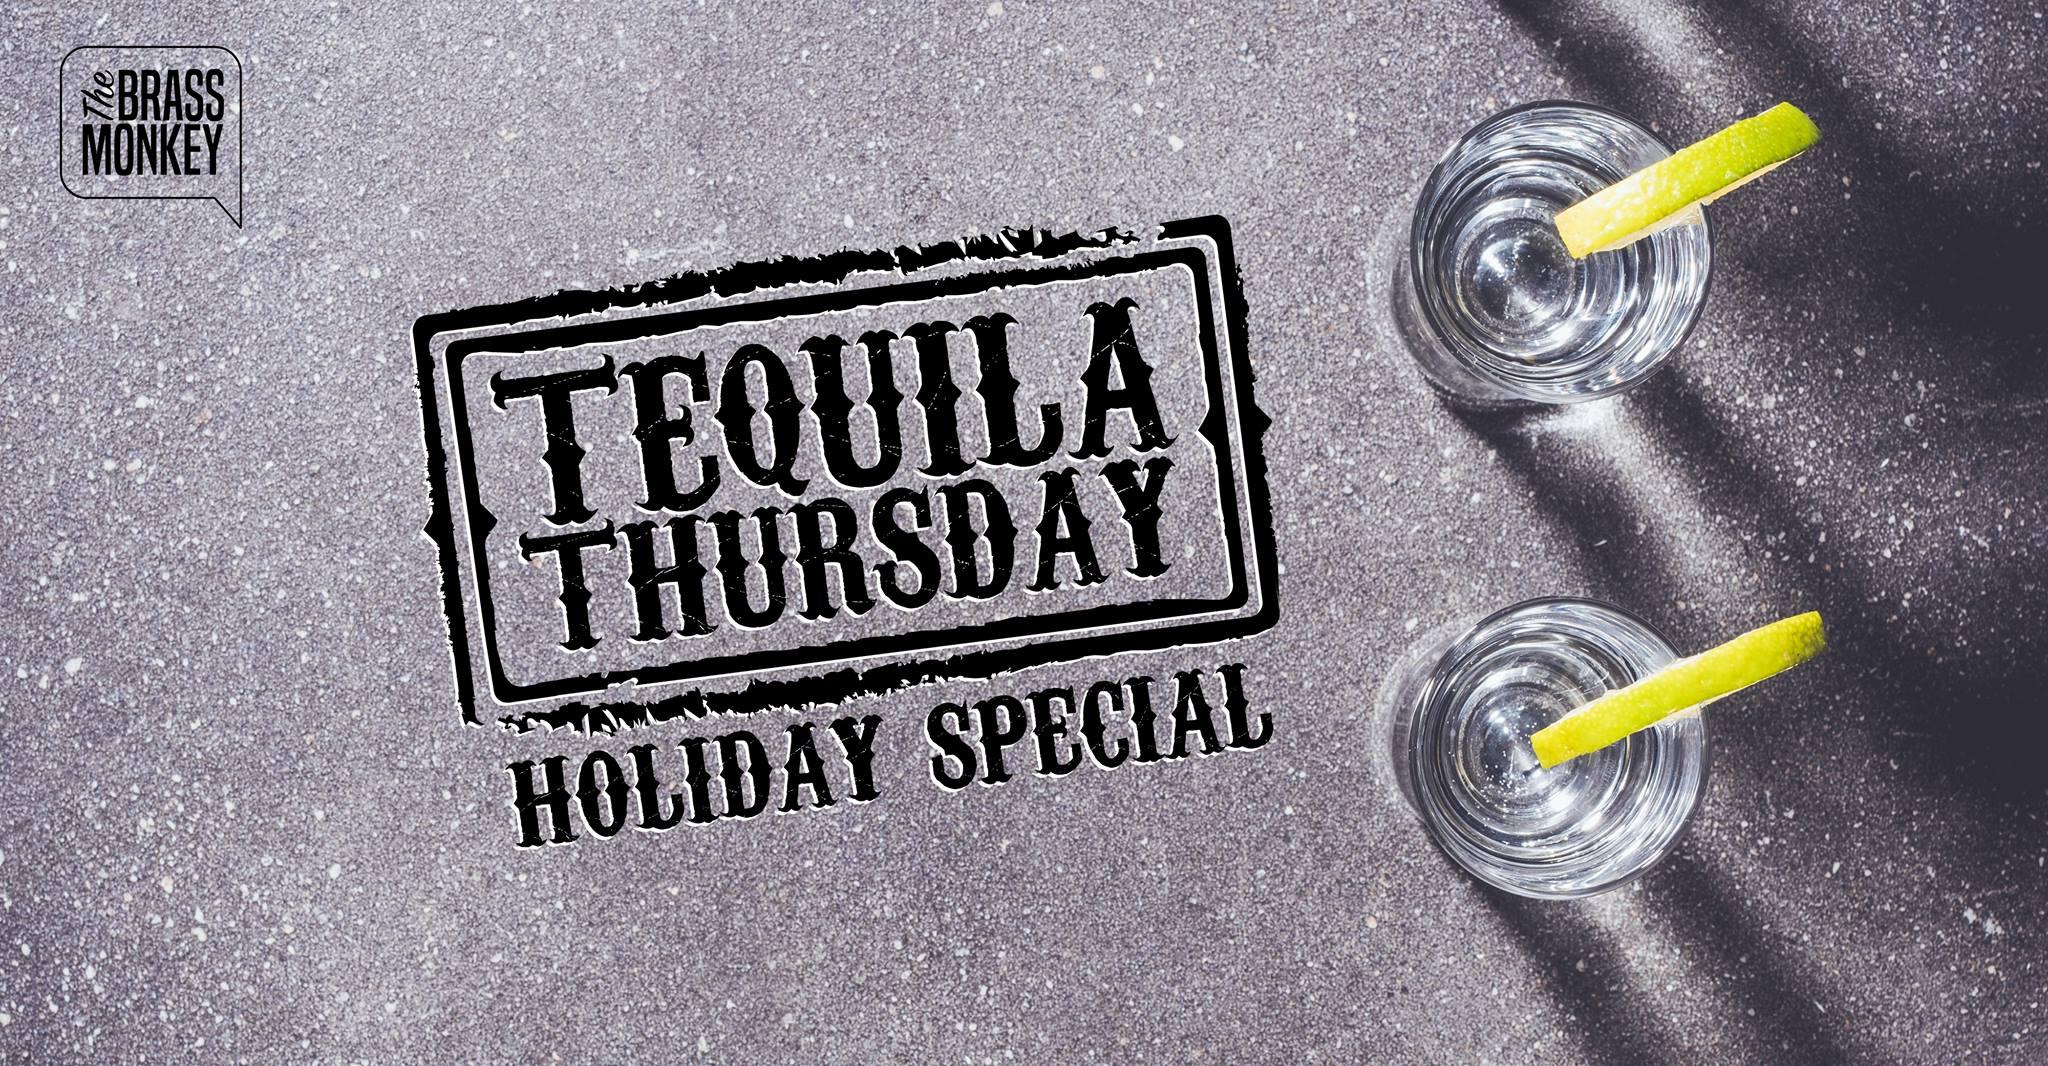 The Brass Monkey Tequila Thursday